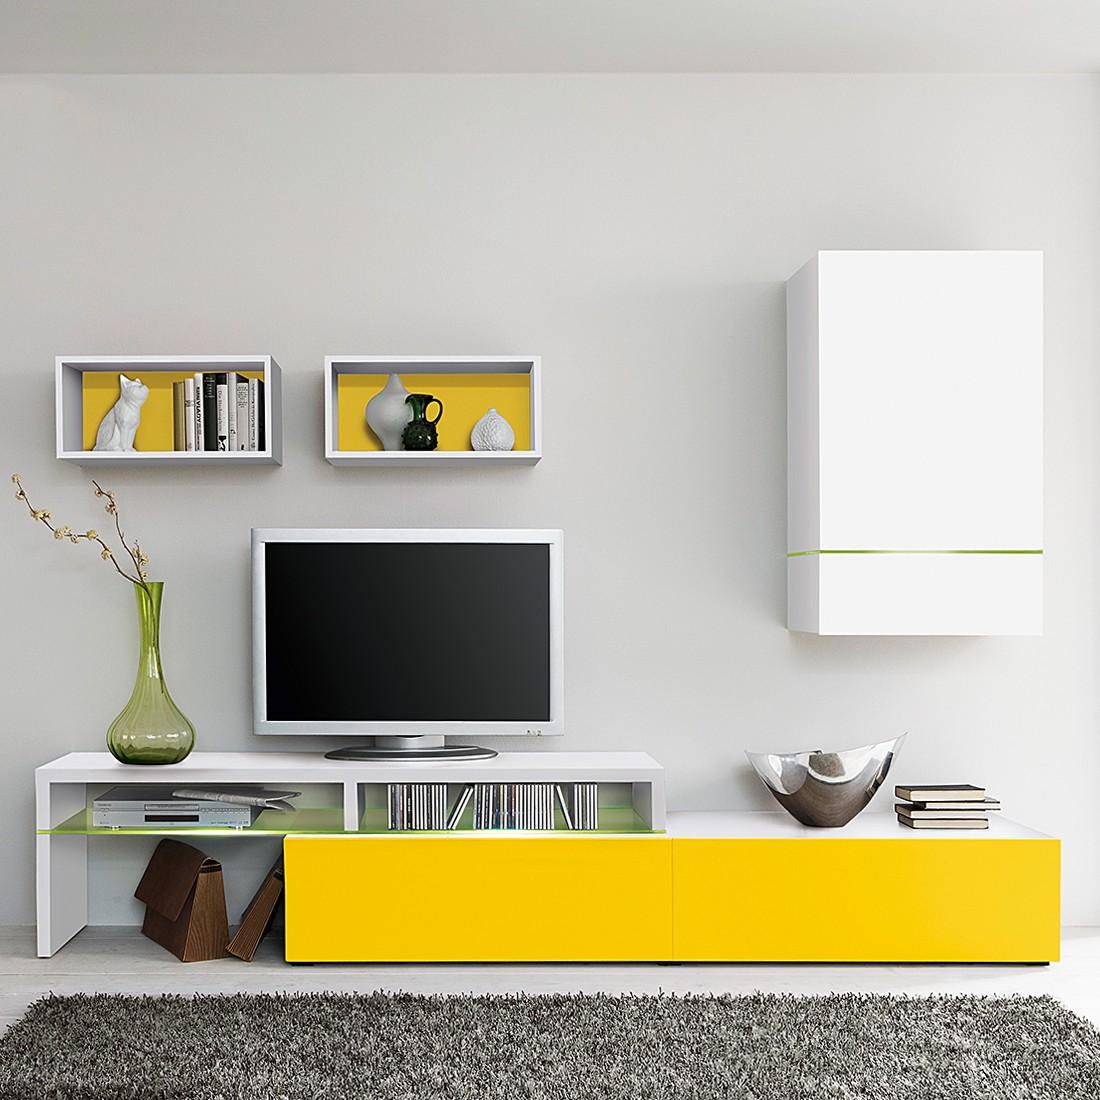 wohnwand colourart 4 teilig wei gelb ohne beleuchtung. Black Bedroom Furniture Sets. Home Design Ideas